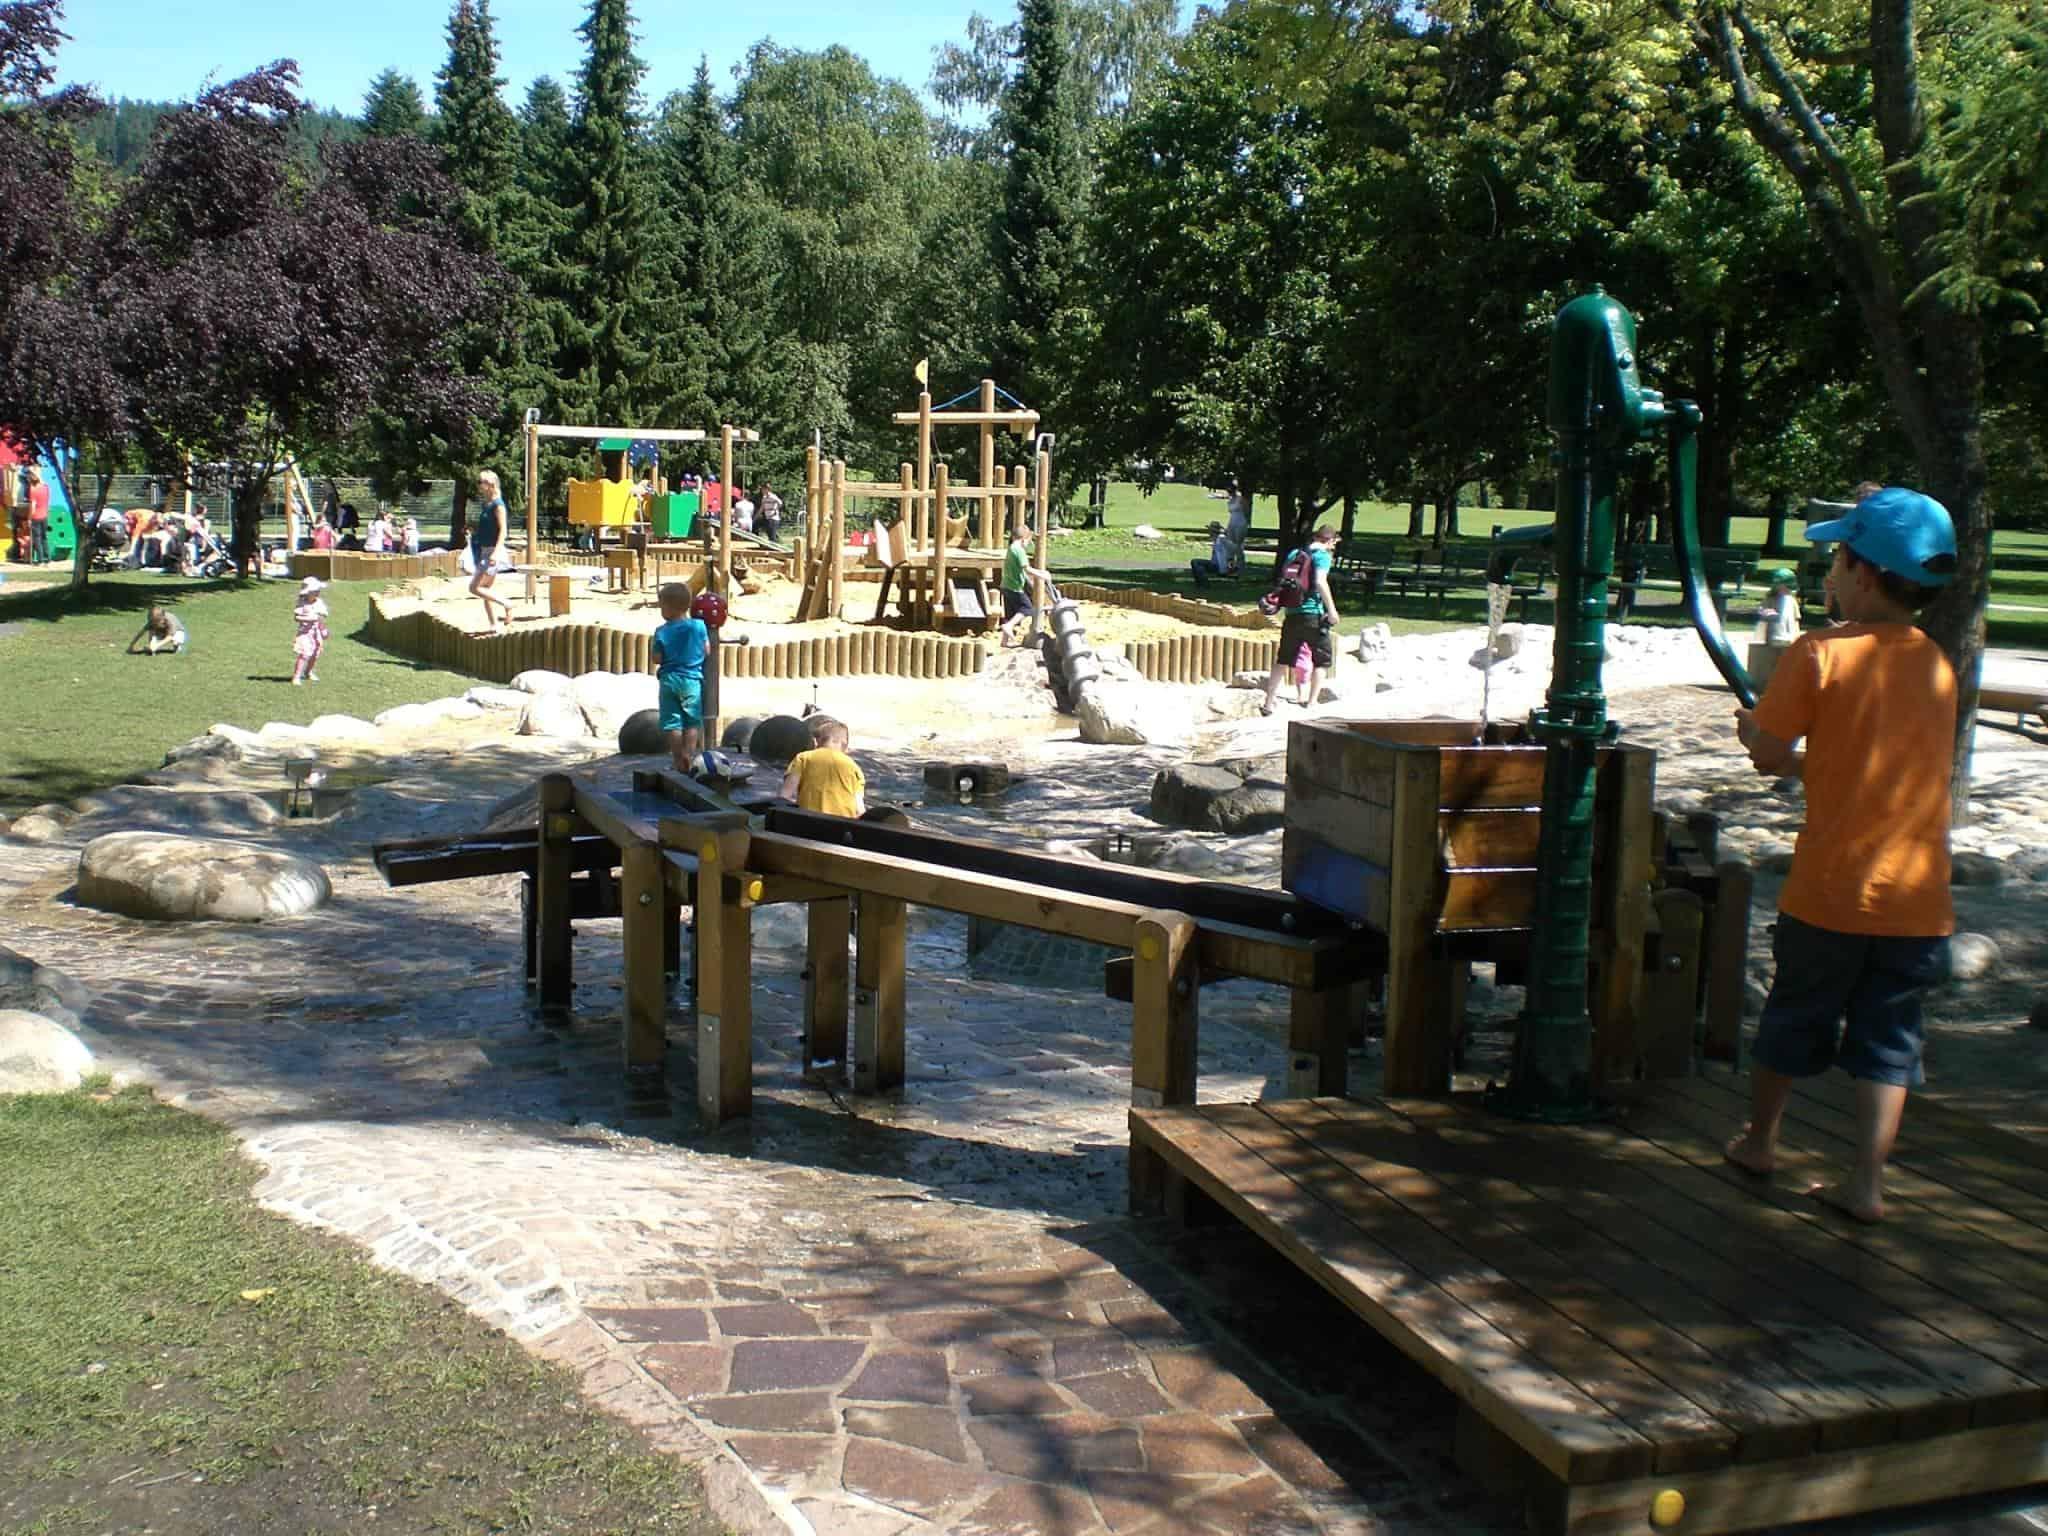 Kinderspielplatz Europapark Klagenfurt - Ausflugsziel mit Familie in Kärnten